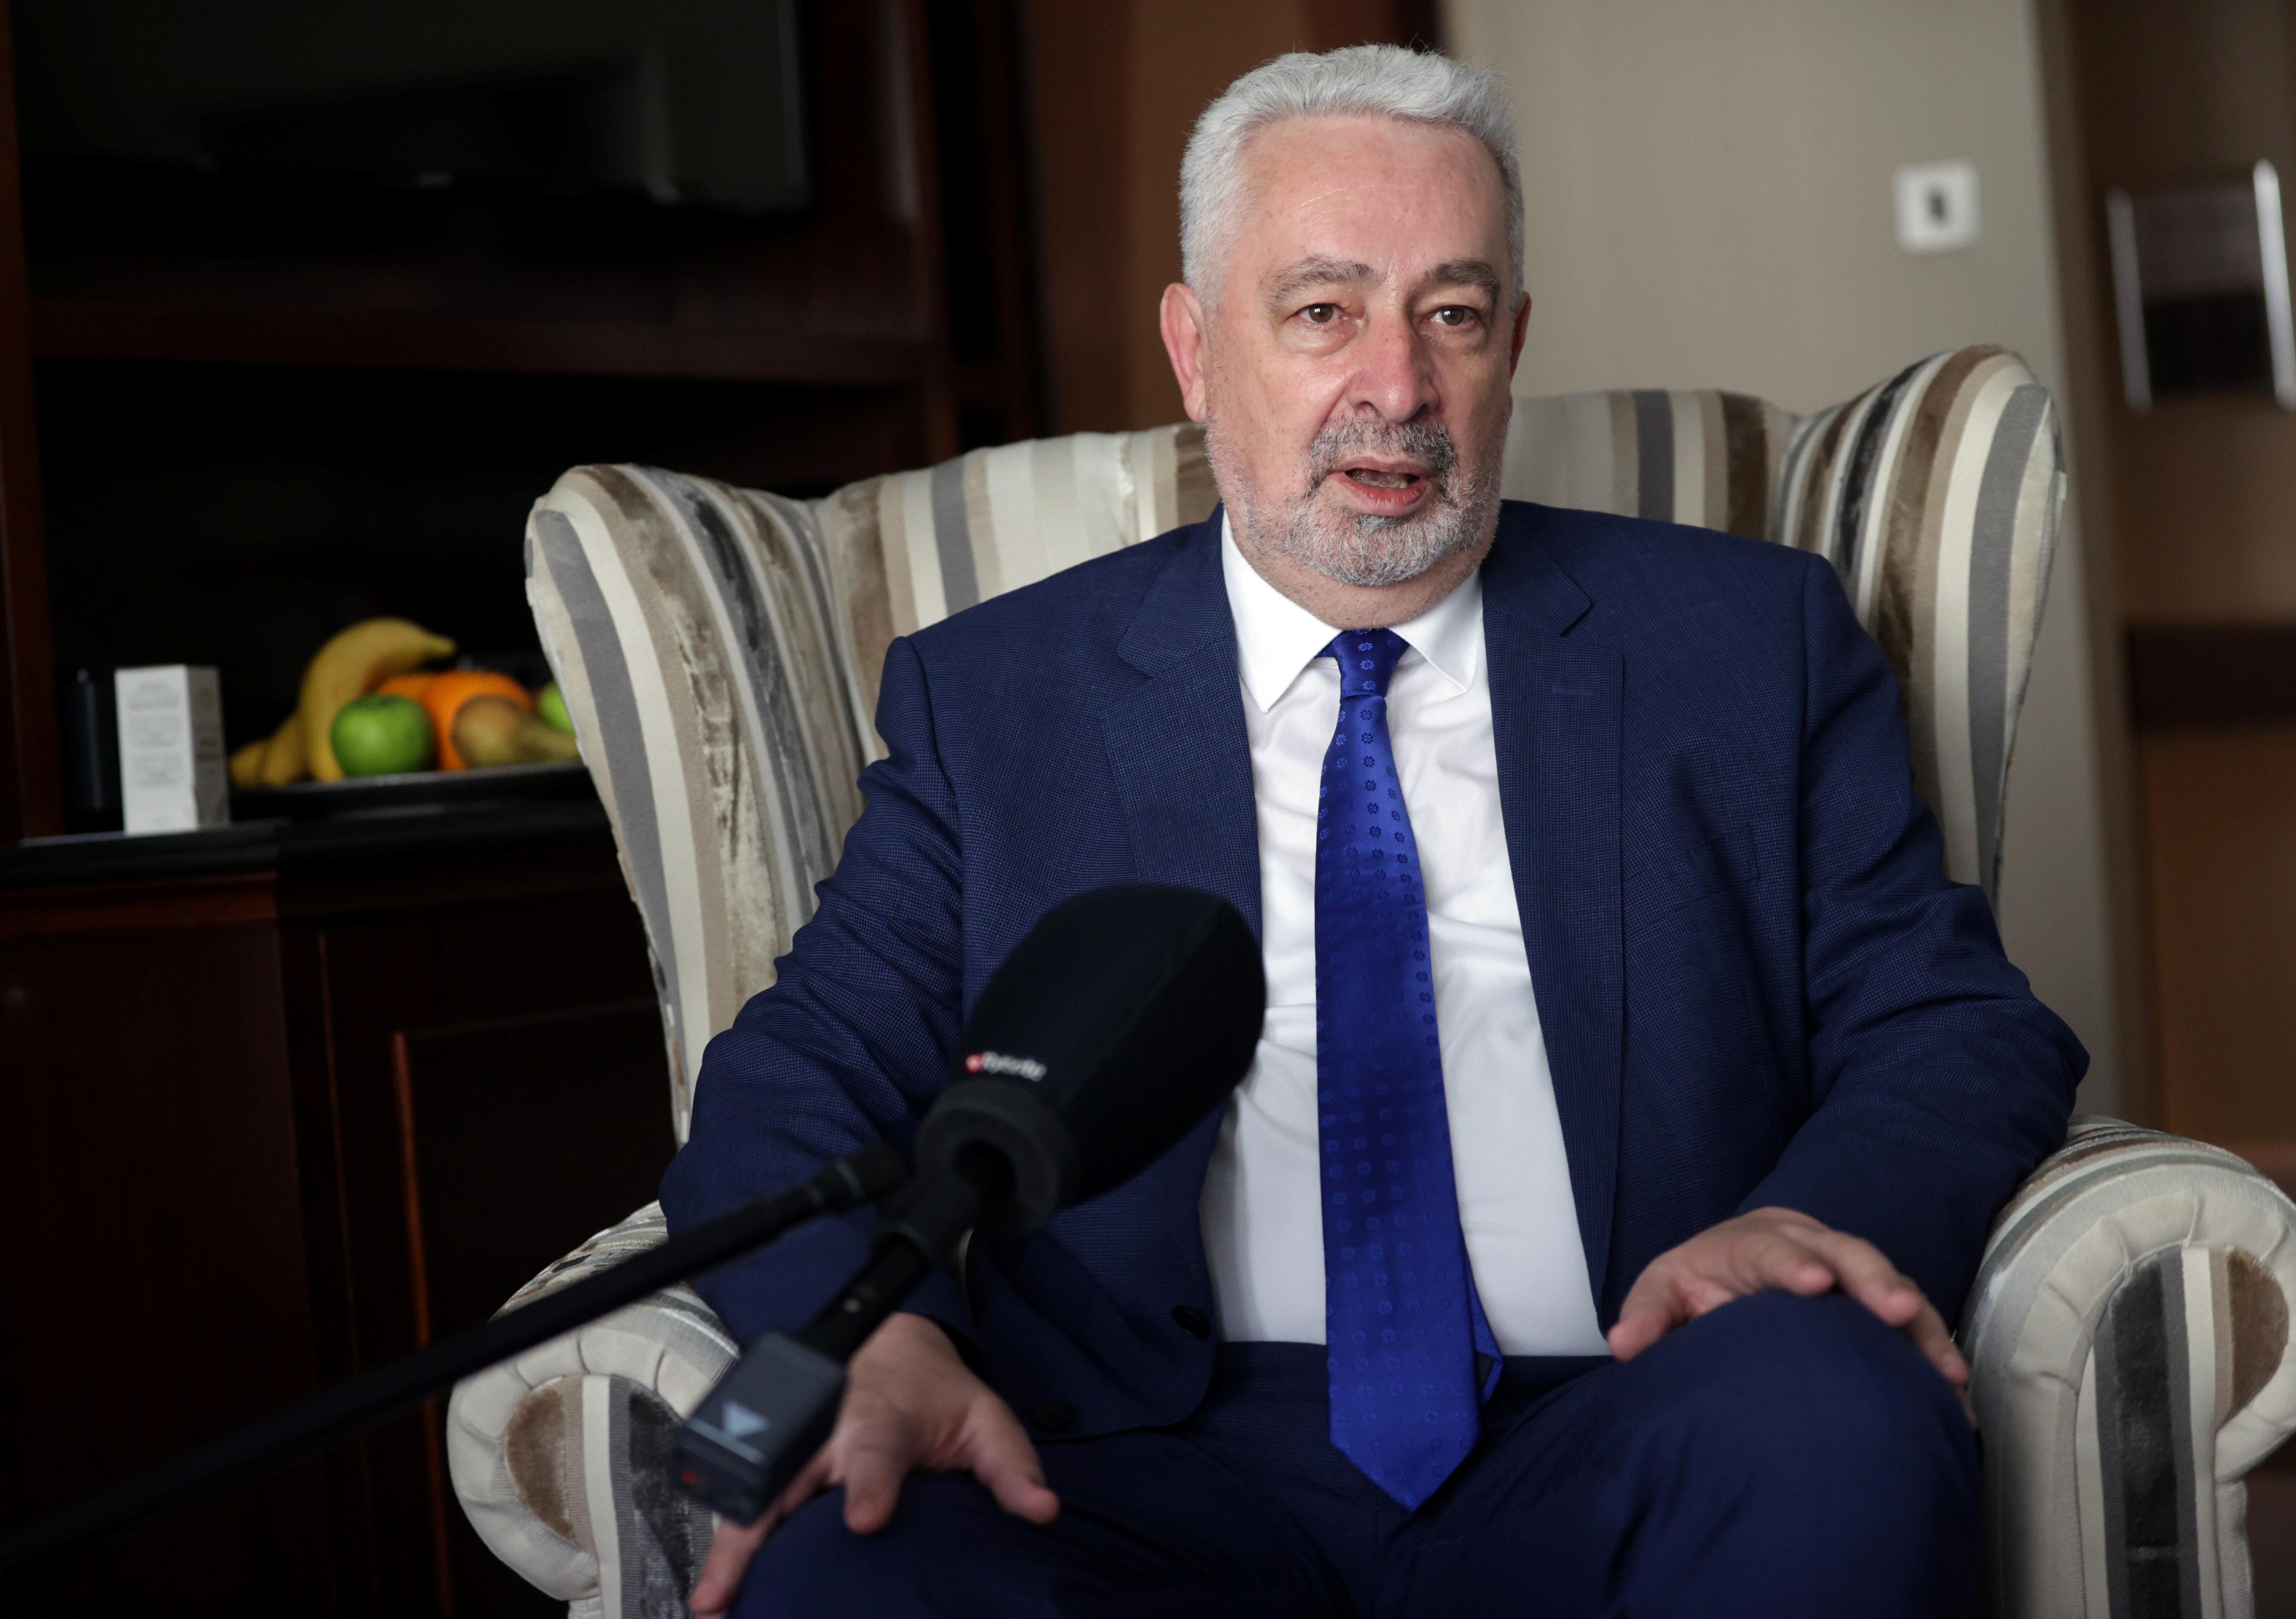 Montenegrin Prime Minister Zdravko Krivokapic speaks during an interview with Reuters in London, Britain, July 6, 2021. REUTERS/Hannah McKay